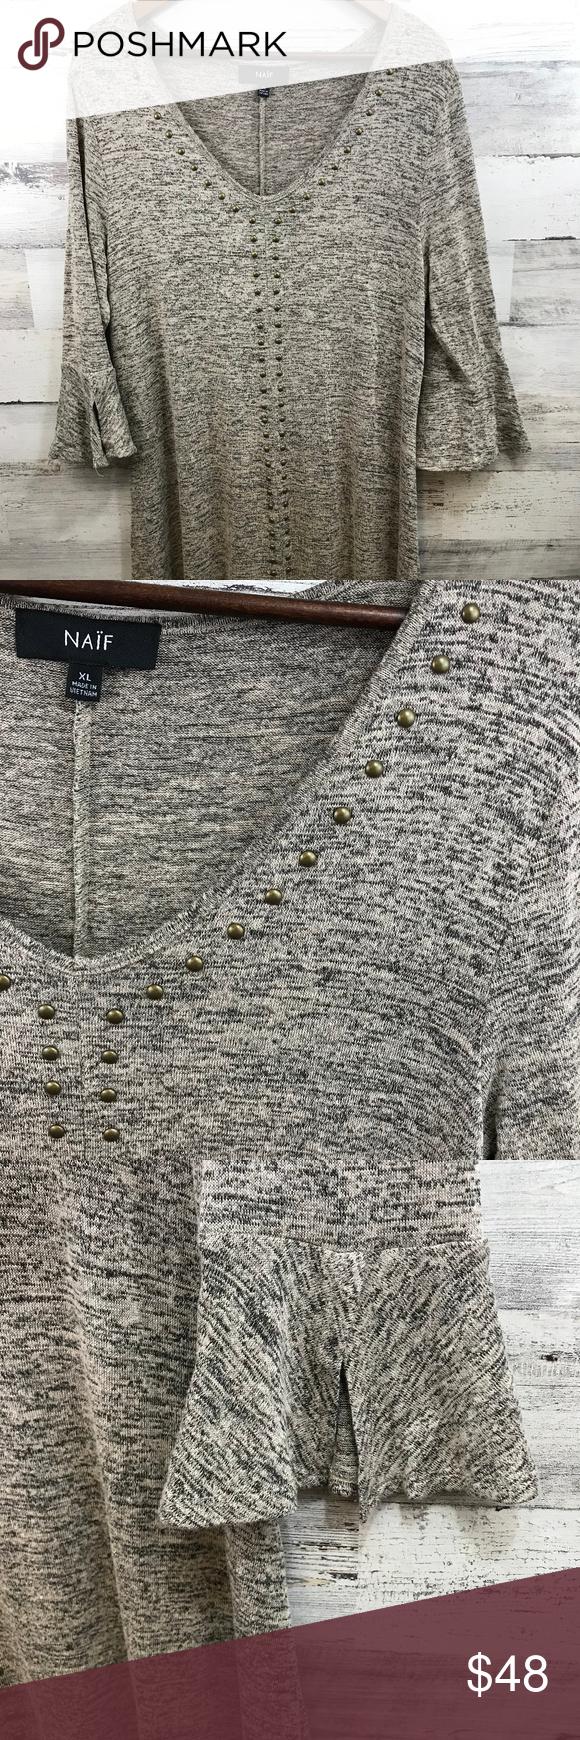 NAIF Heather Grey Dress [519b16] Super soft and comfy. Excellent condition. 0923 NAIF Dresses